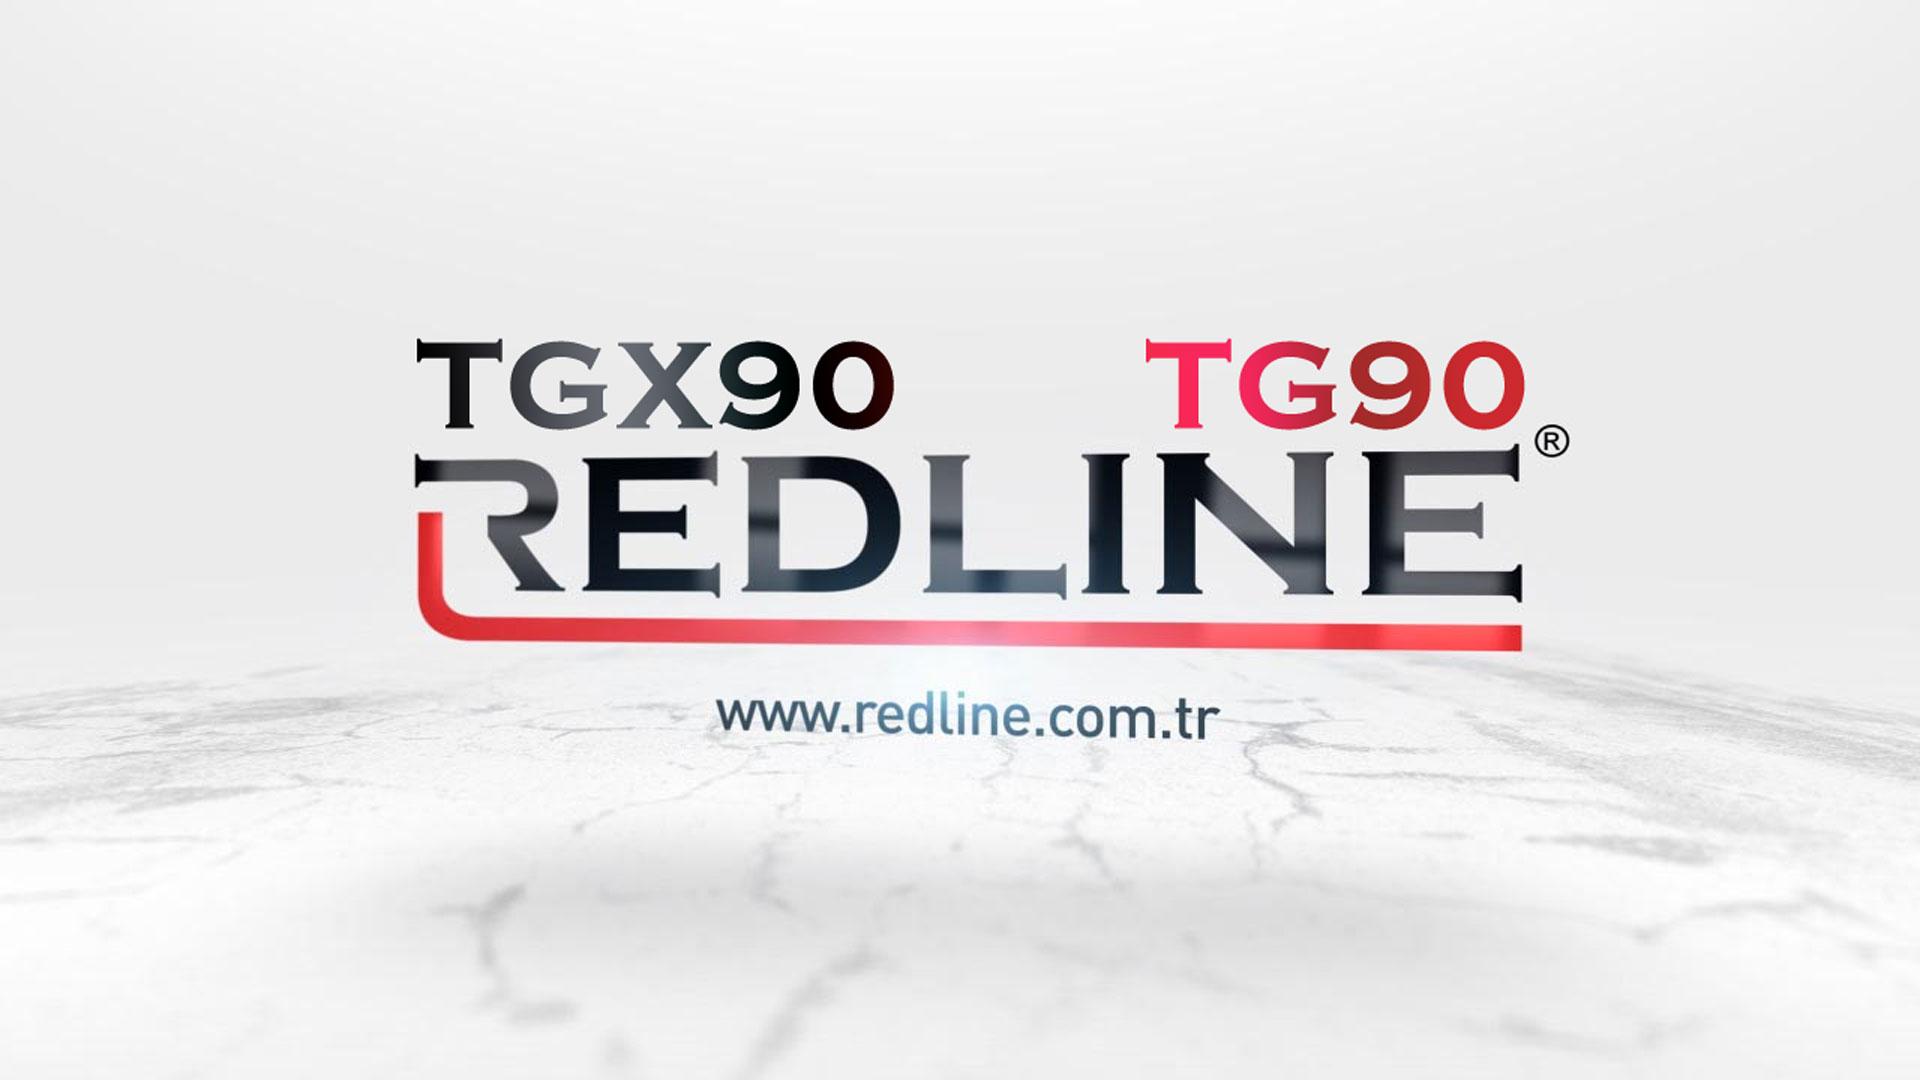 Download Software Redline TG 90 Full HD TGX90 Firmware Receiver